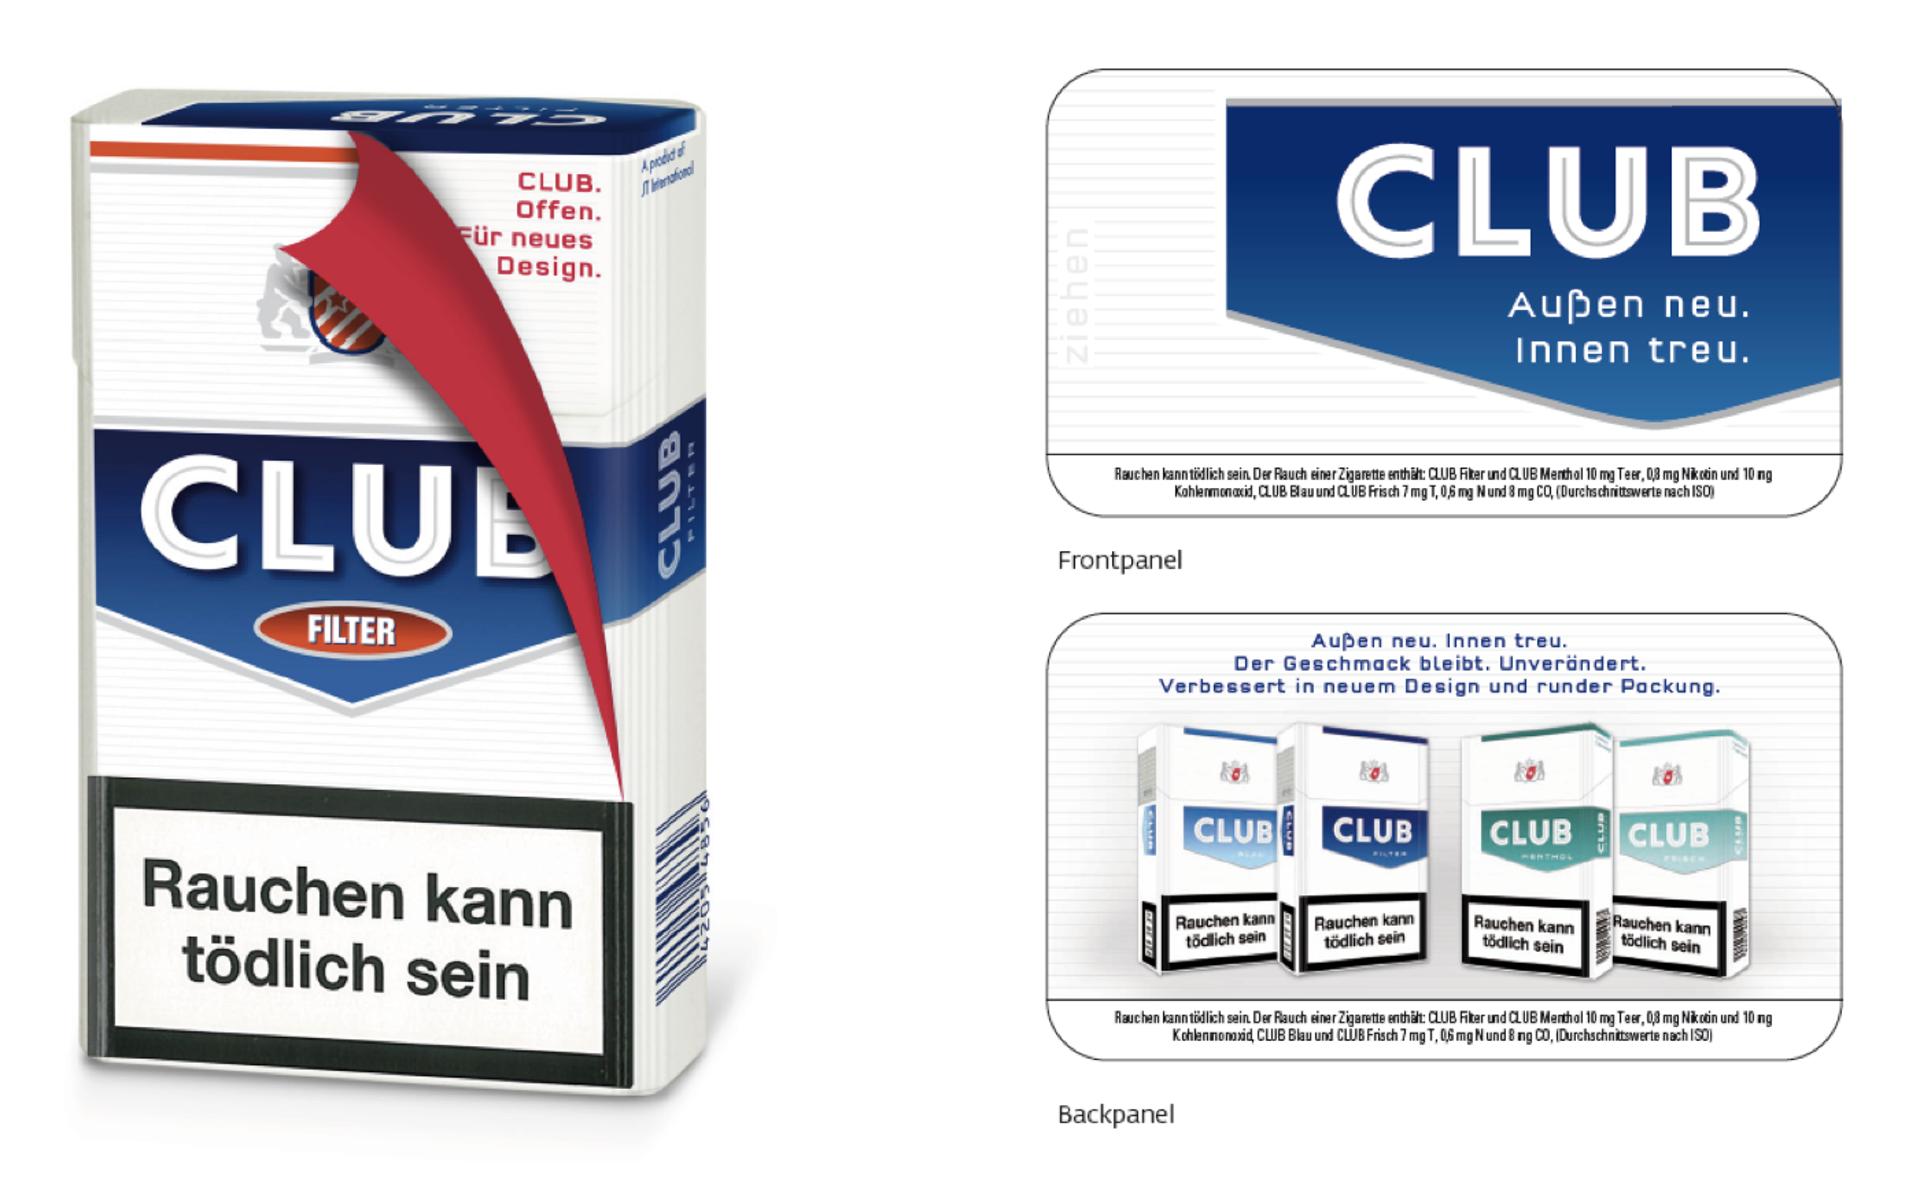 Palis & Mohrmann GbR - CLUB